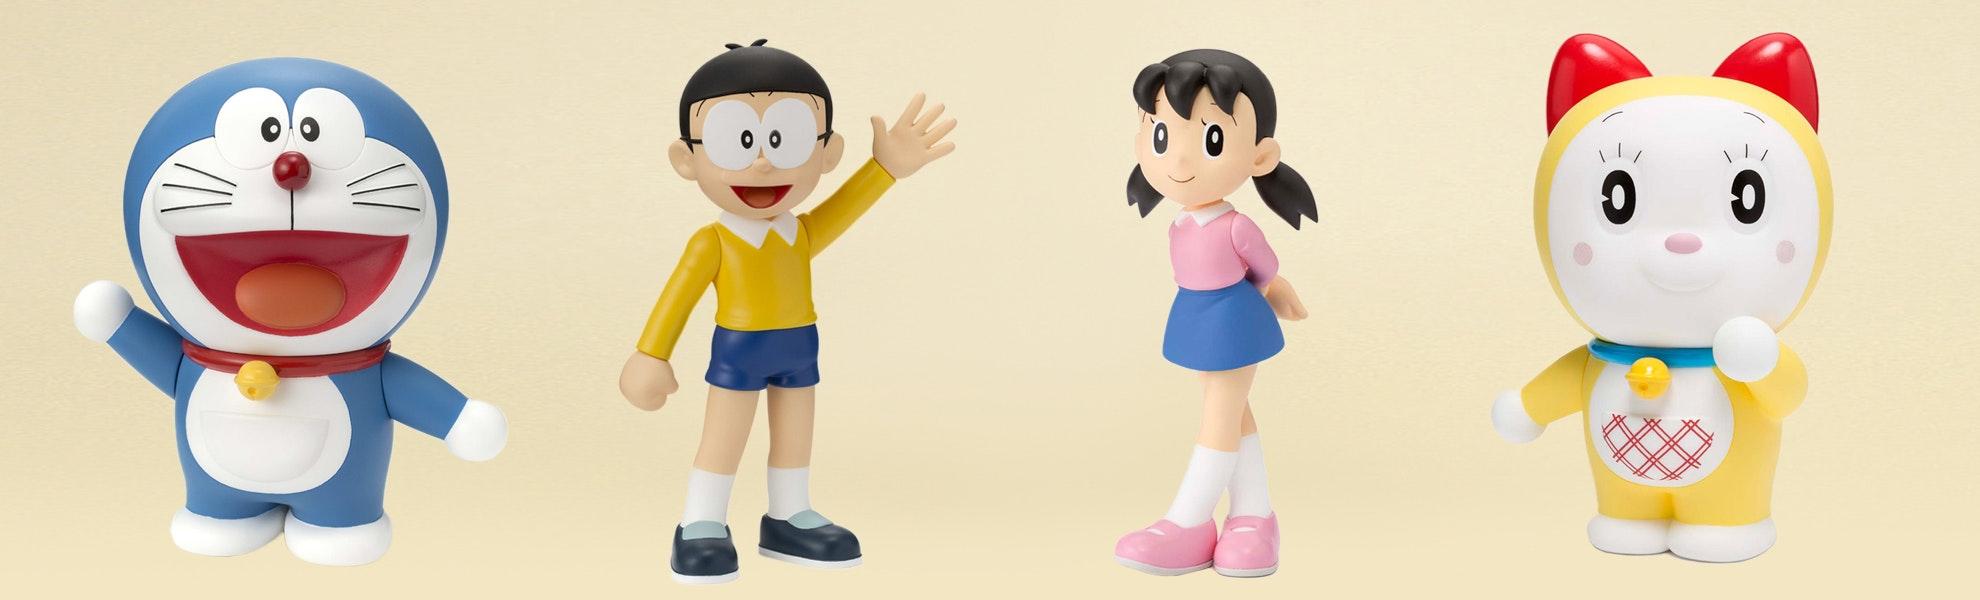 Figuarts ZERO: Doraemon and Friends (2-Pack)